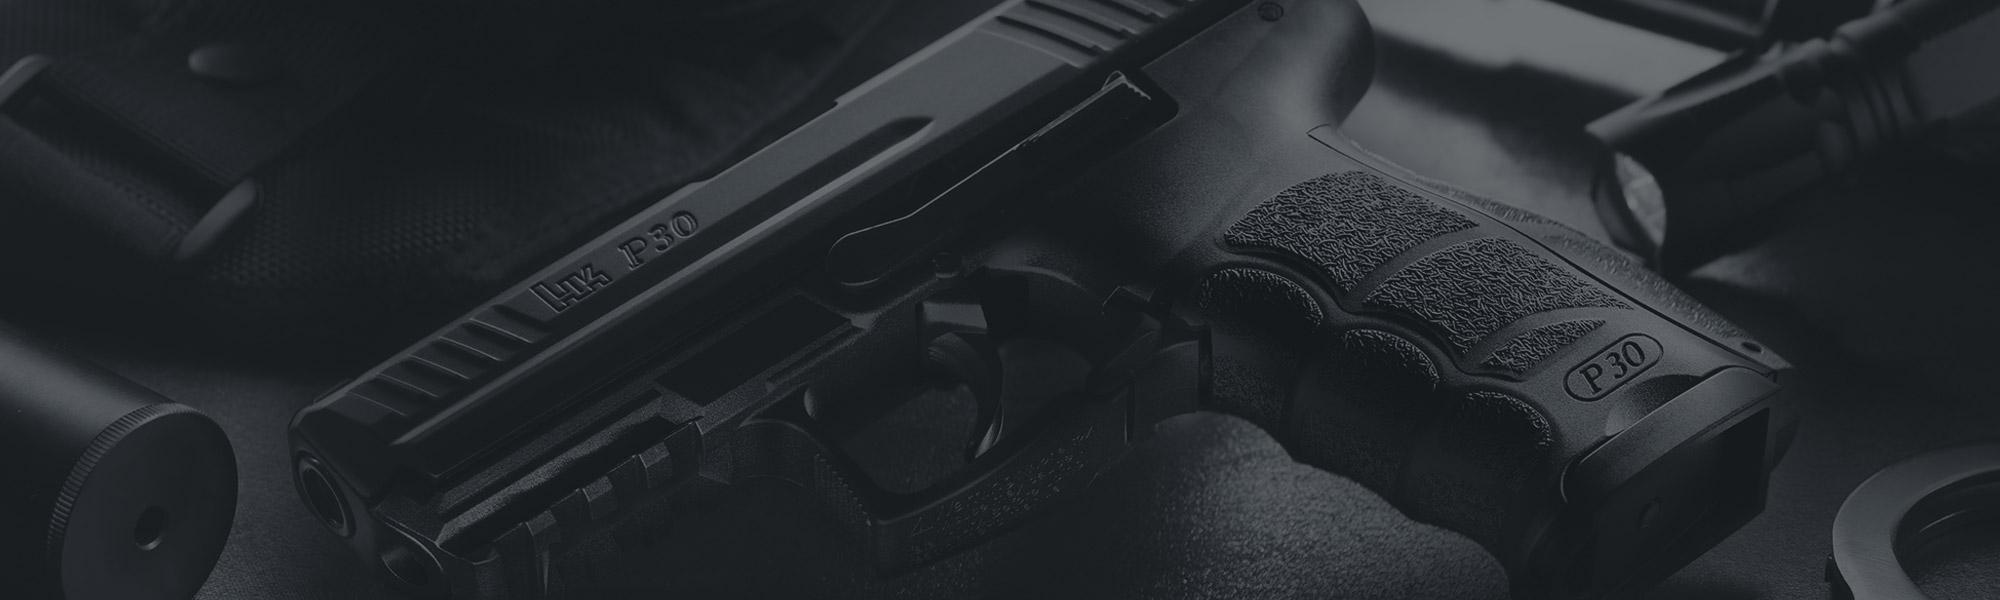 Heckler & Koch - Gas Signal Guns